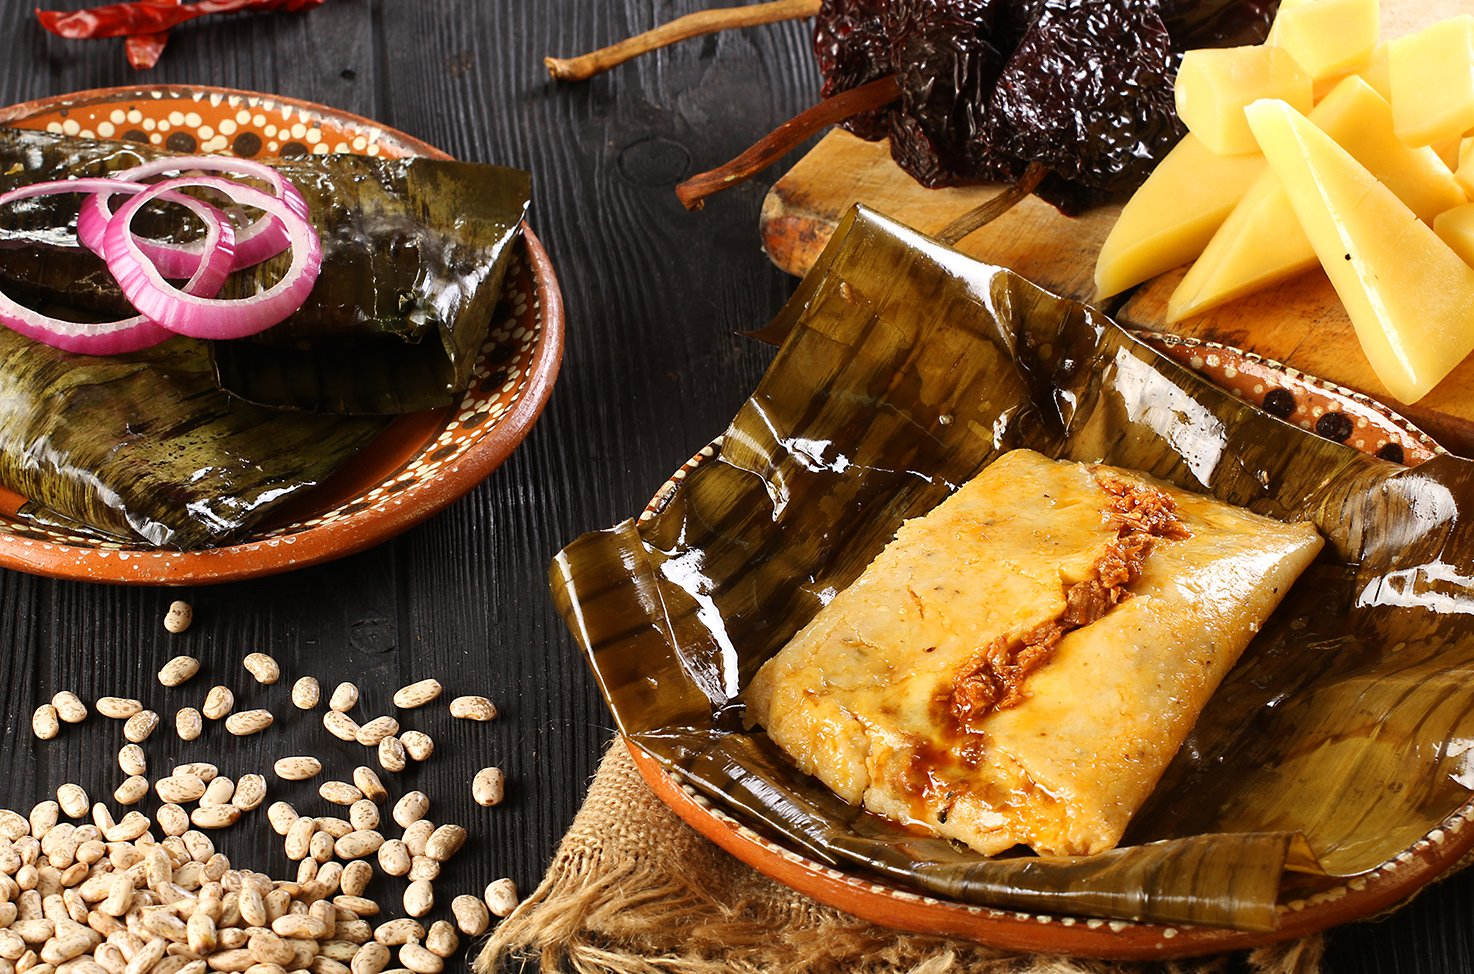 https://0201.nccdn.net/1_2/000/000/11c/452/IMG_5283-frijol-con-queso-y-salsa-de-chicharron.JPG